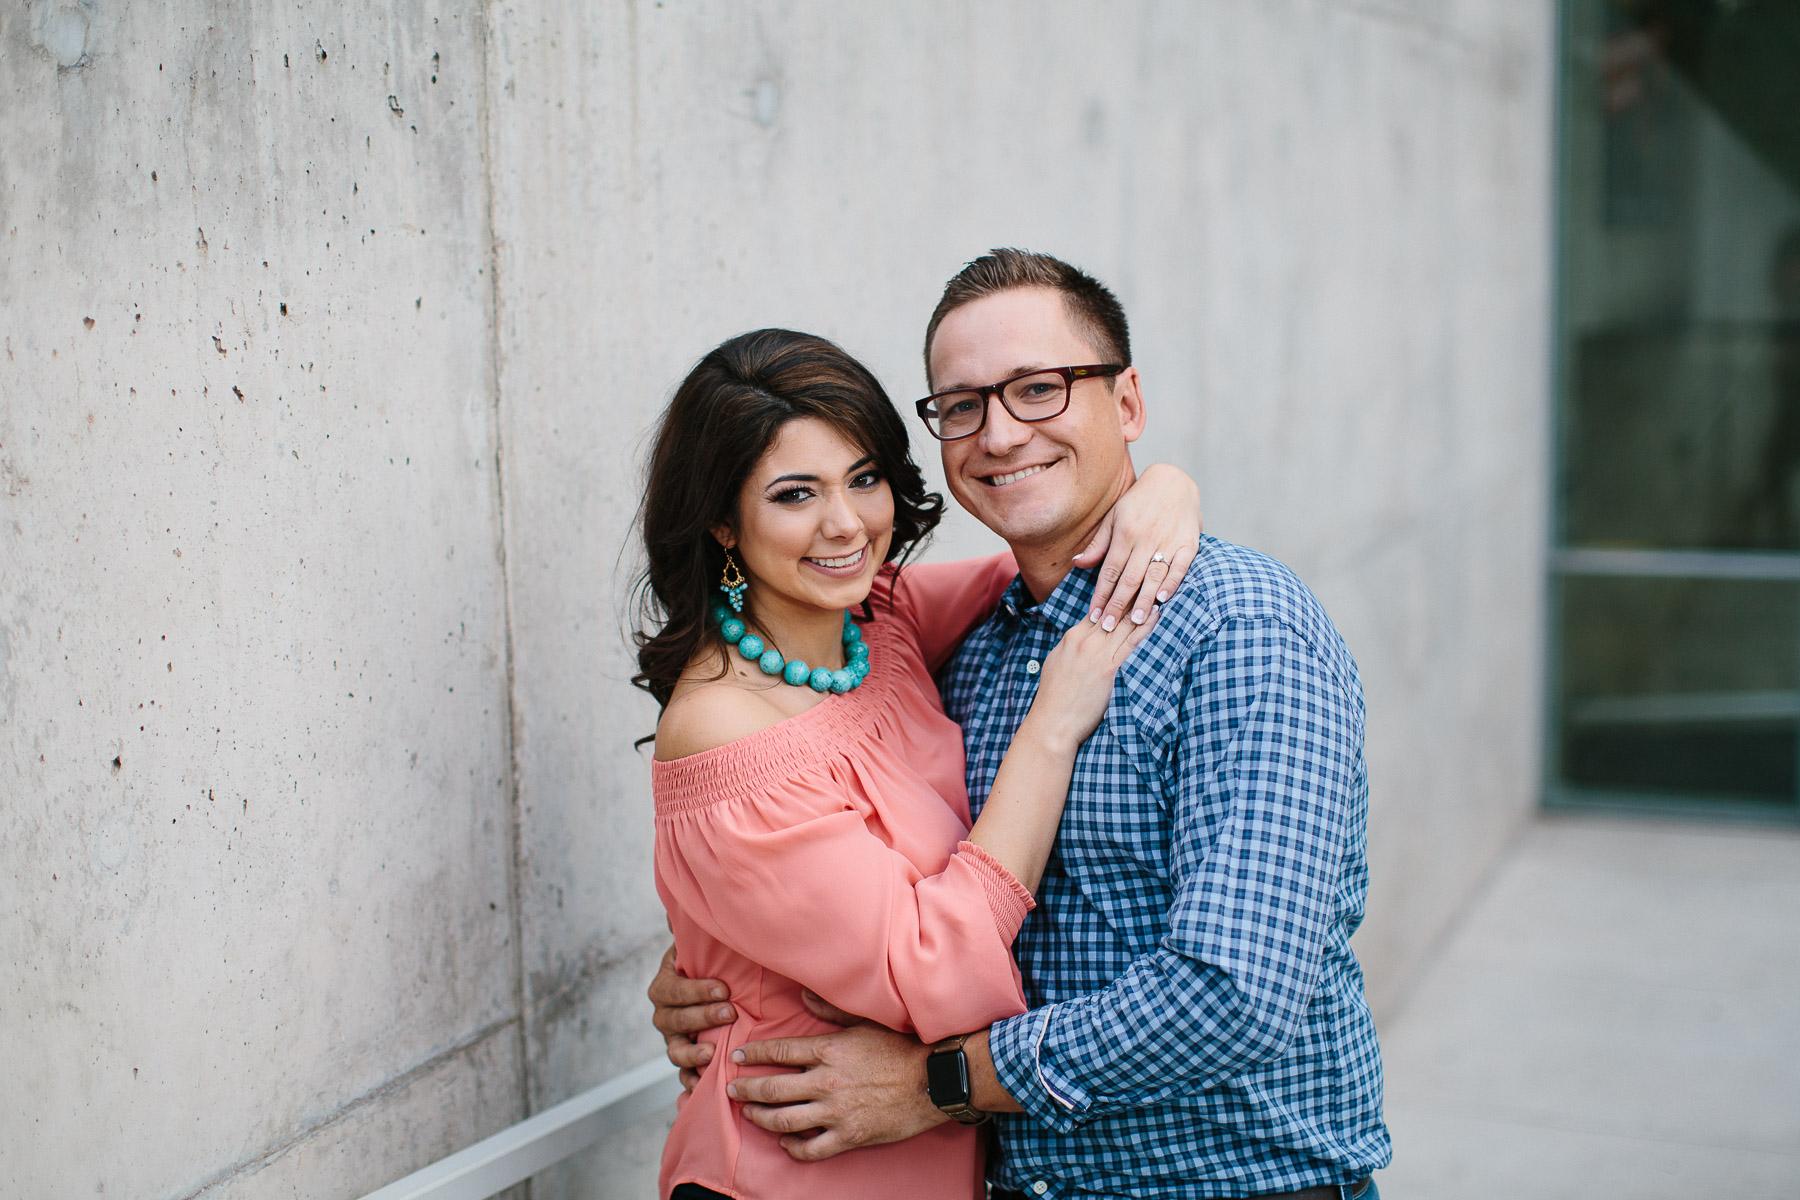 Luxium-Weddings-@matt__le-Engagement-Heritage-Square-Park-Downtown-Phoenix-Urban-Photography-107.jpg